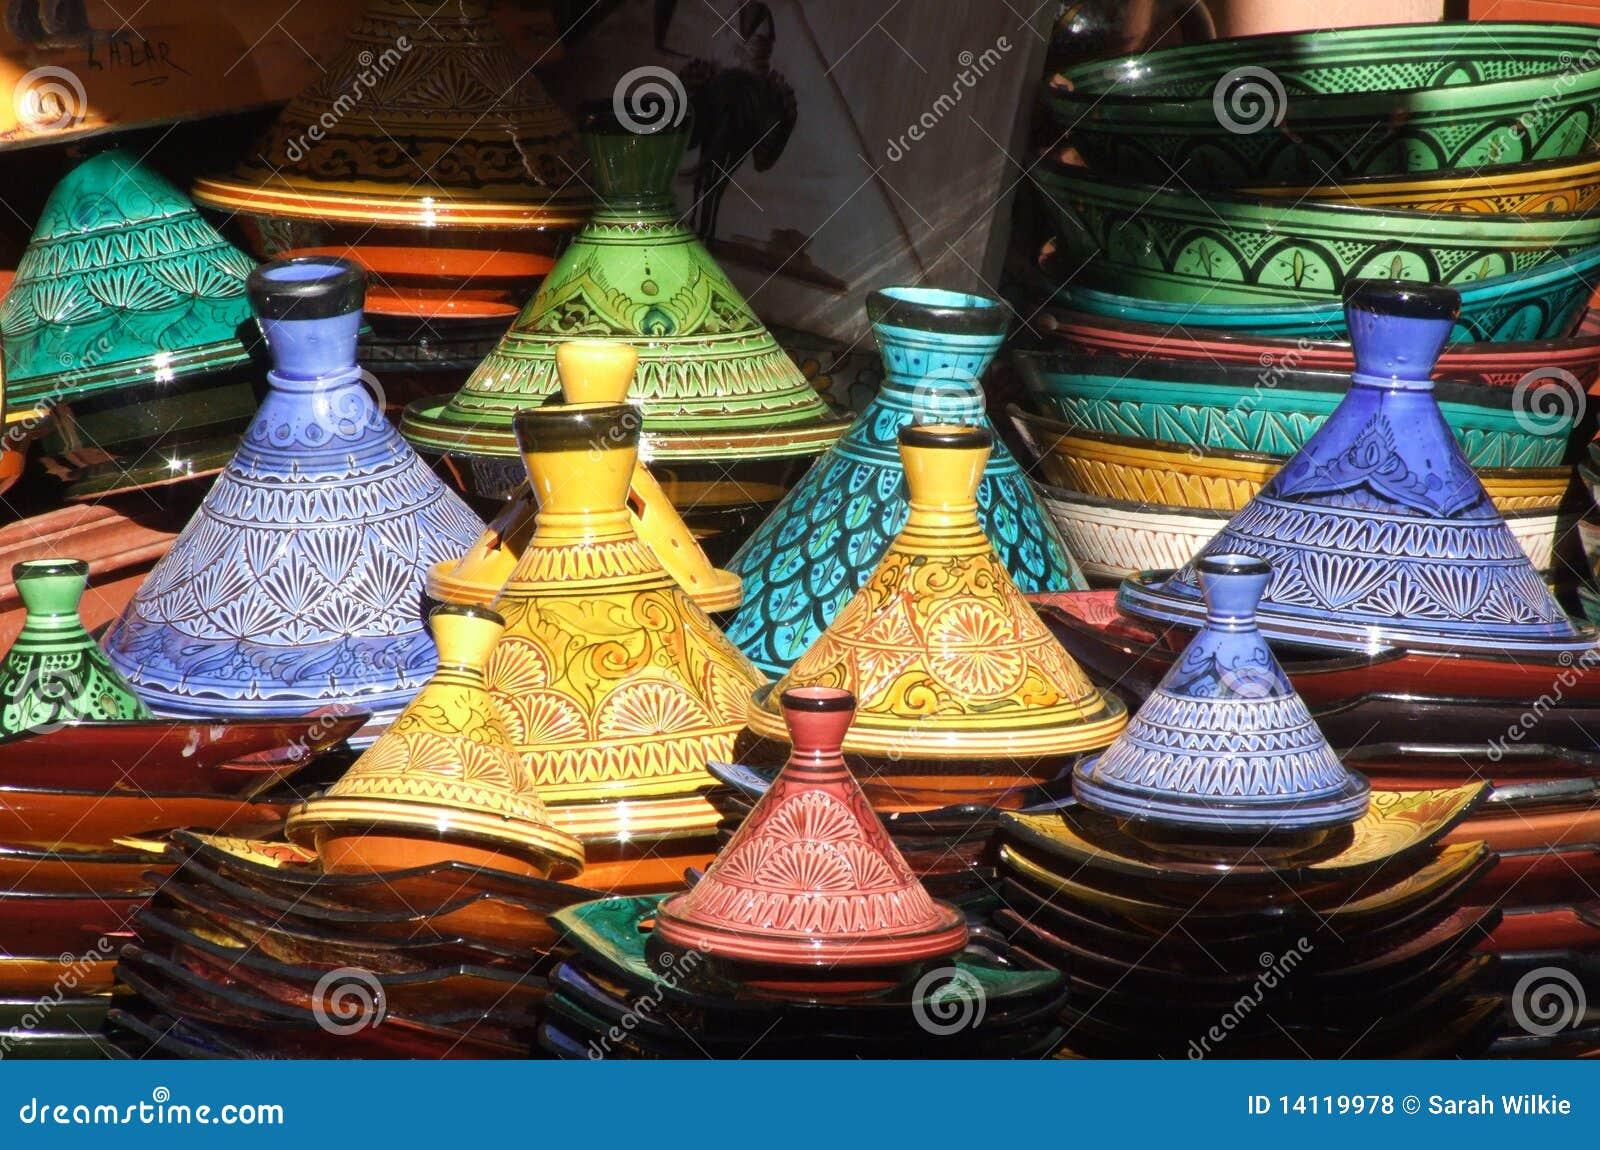 Tagine Potenziometer, Marrakesch souk